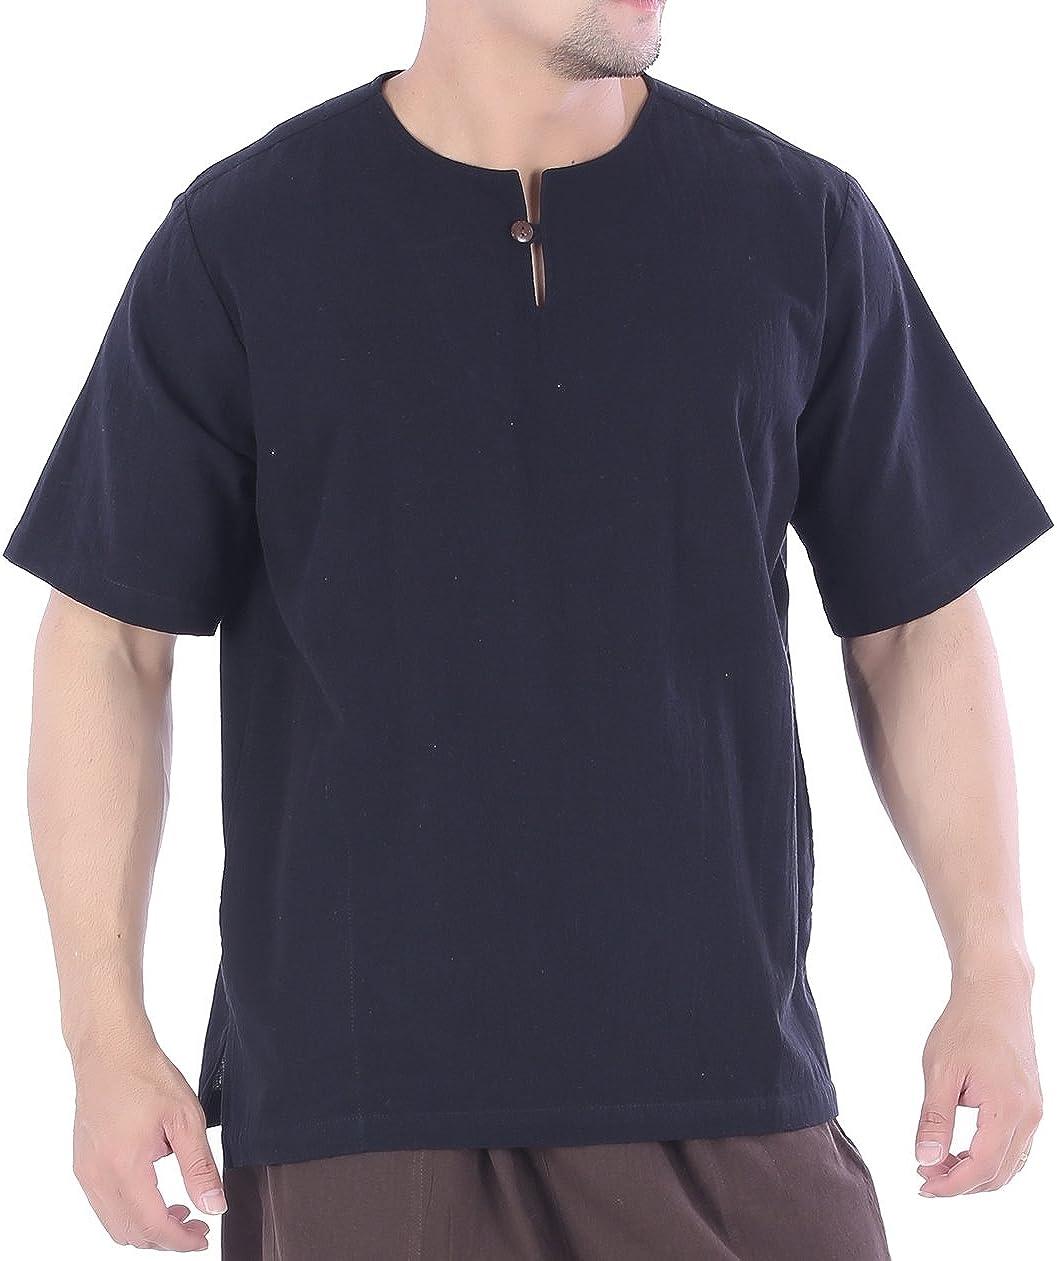 YUSKY Mens Cotton Linen Classic Pocket Summer Relaxed-Fit Shirt Top